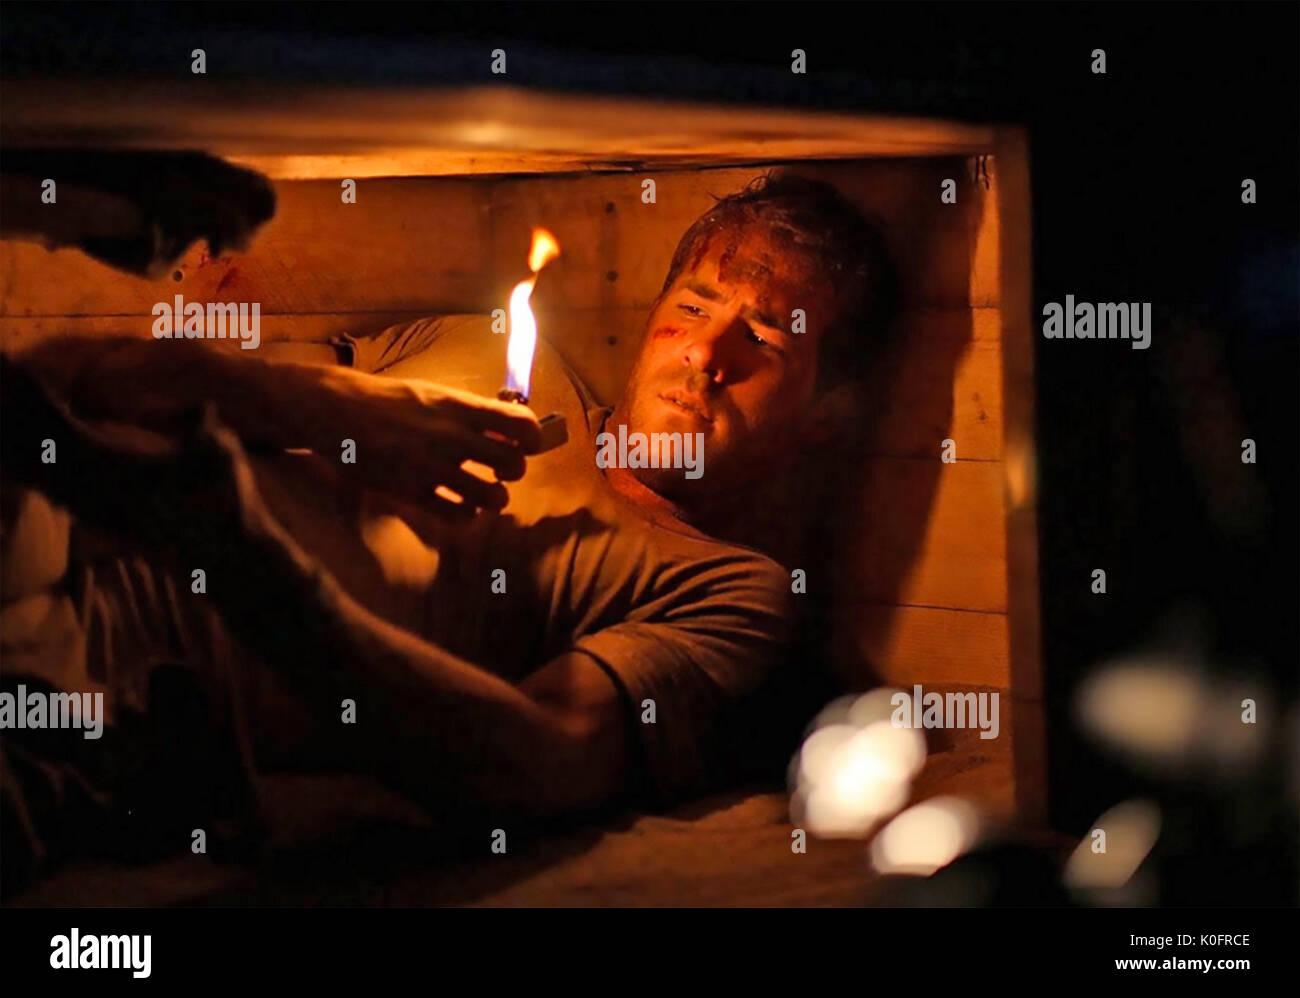 Buried 2010 Audiovisual Aval Sgr Film With Ryan Reynolds Stock Photo Alamy Buried